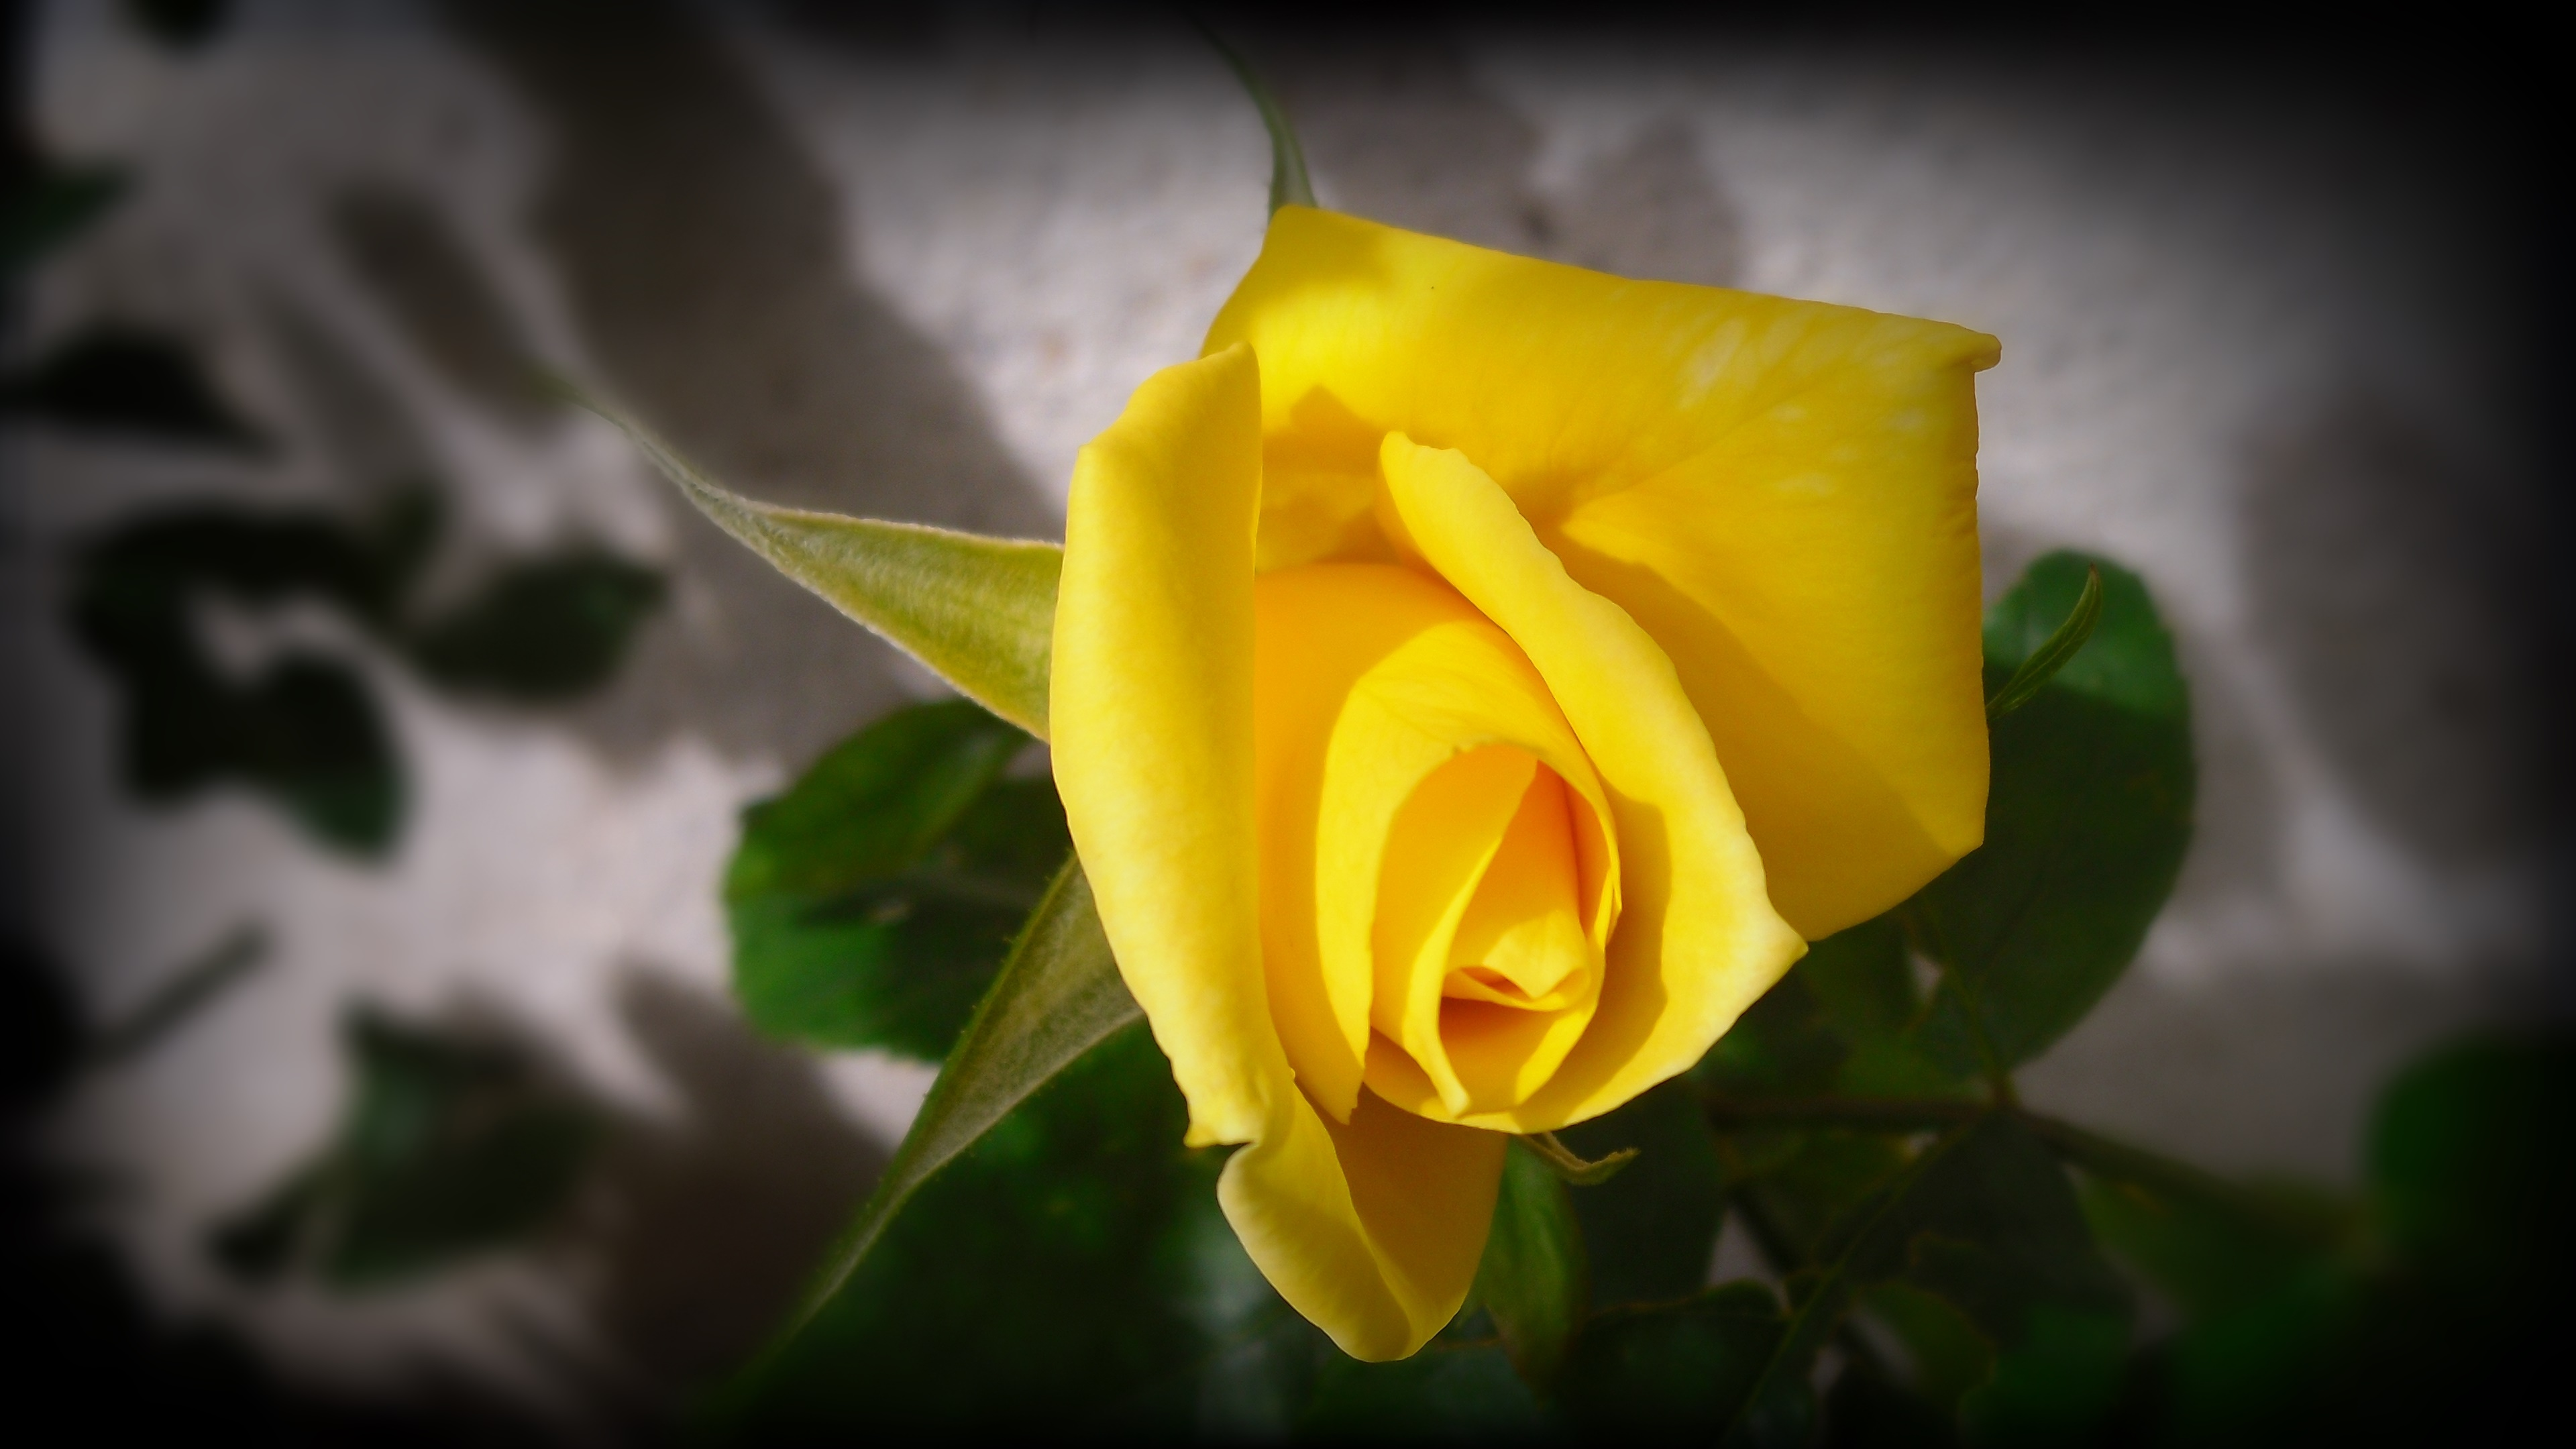 Yellow rose in my little garden wallpaper